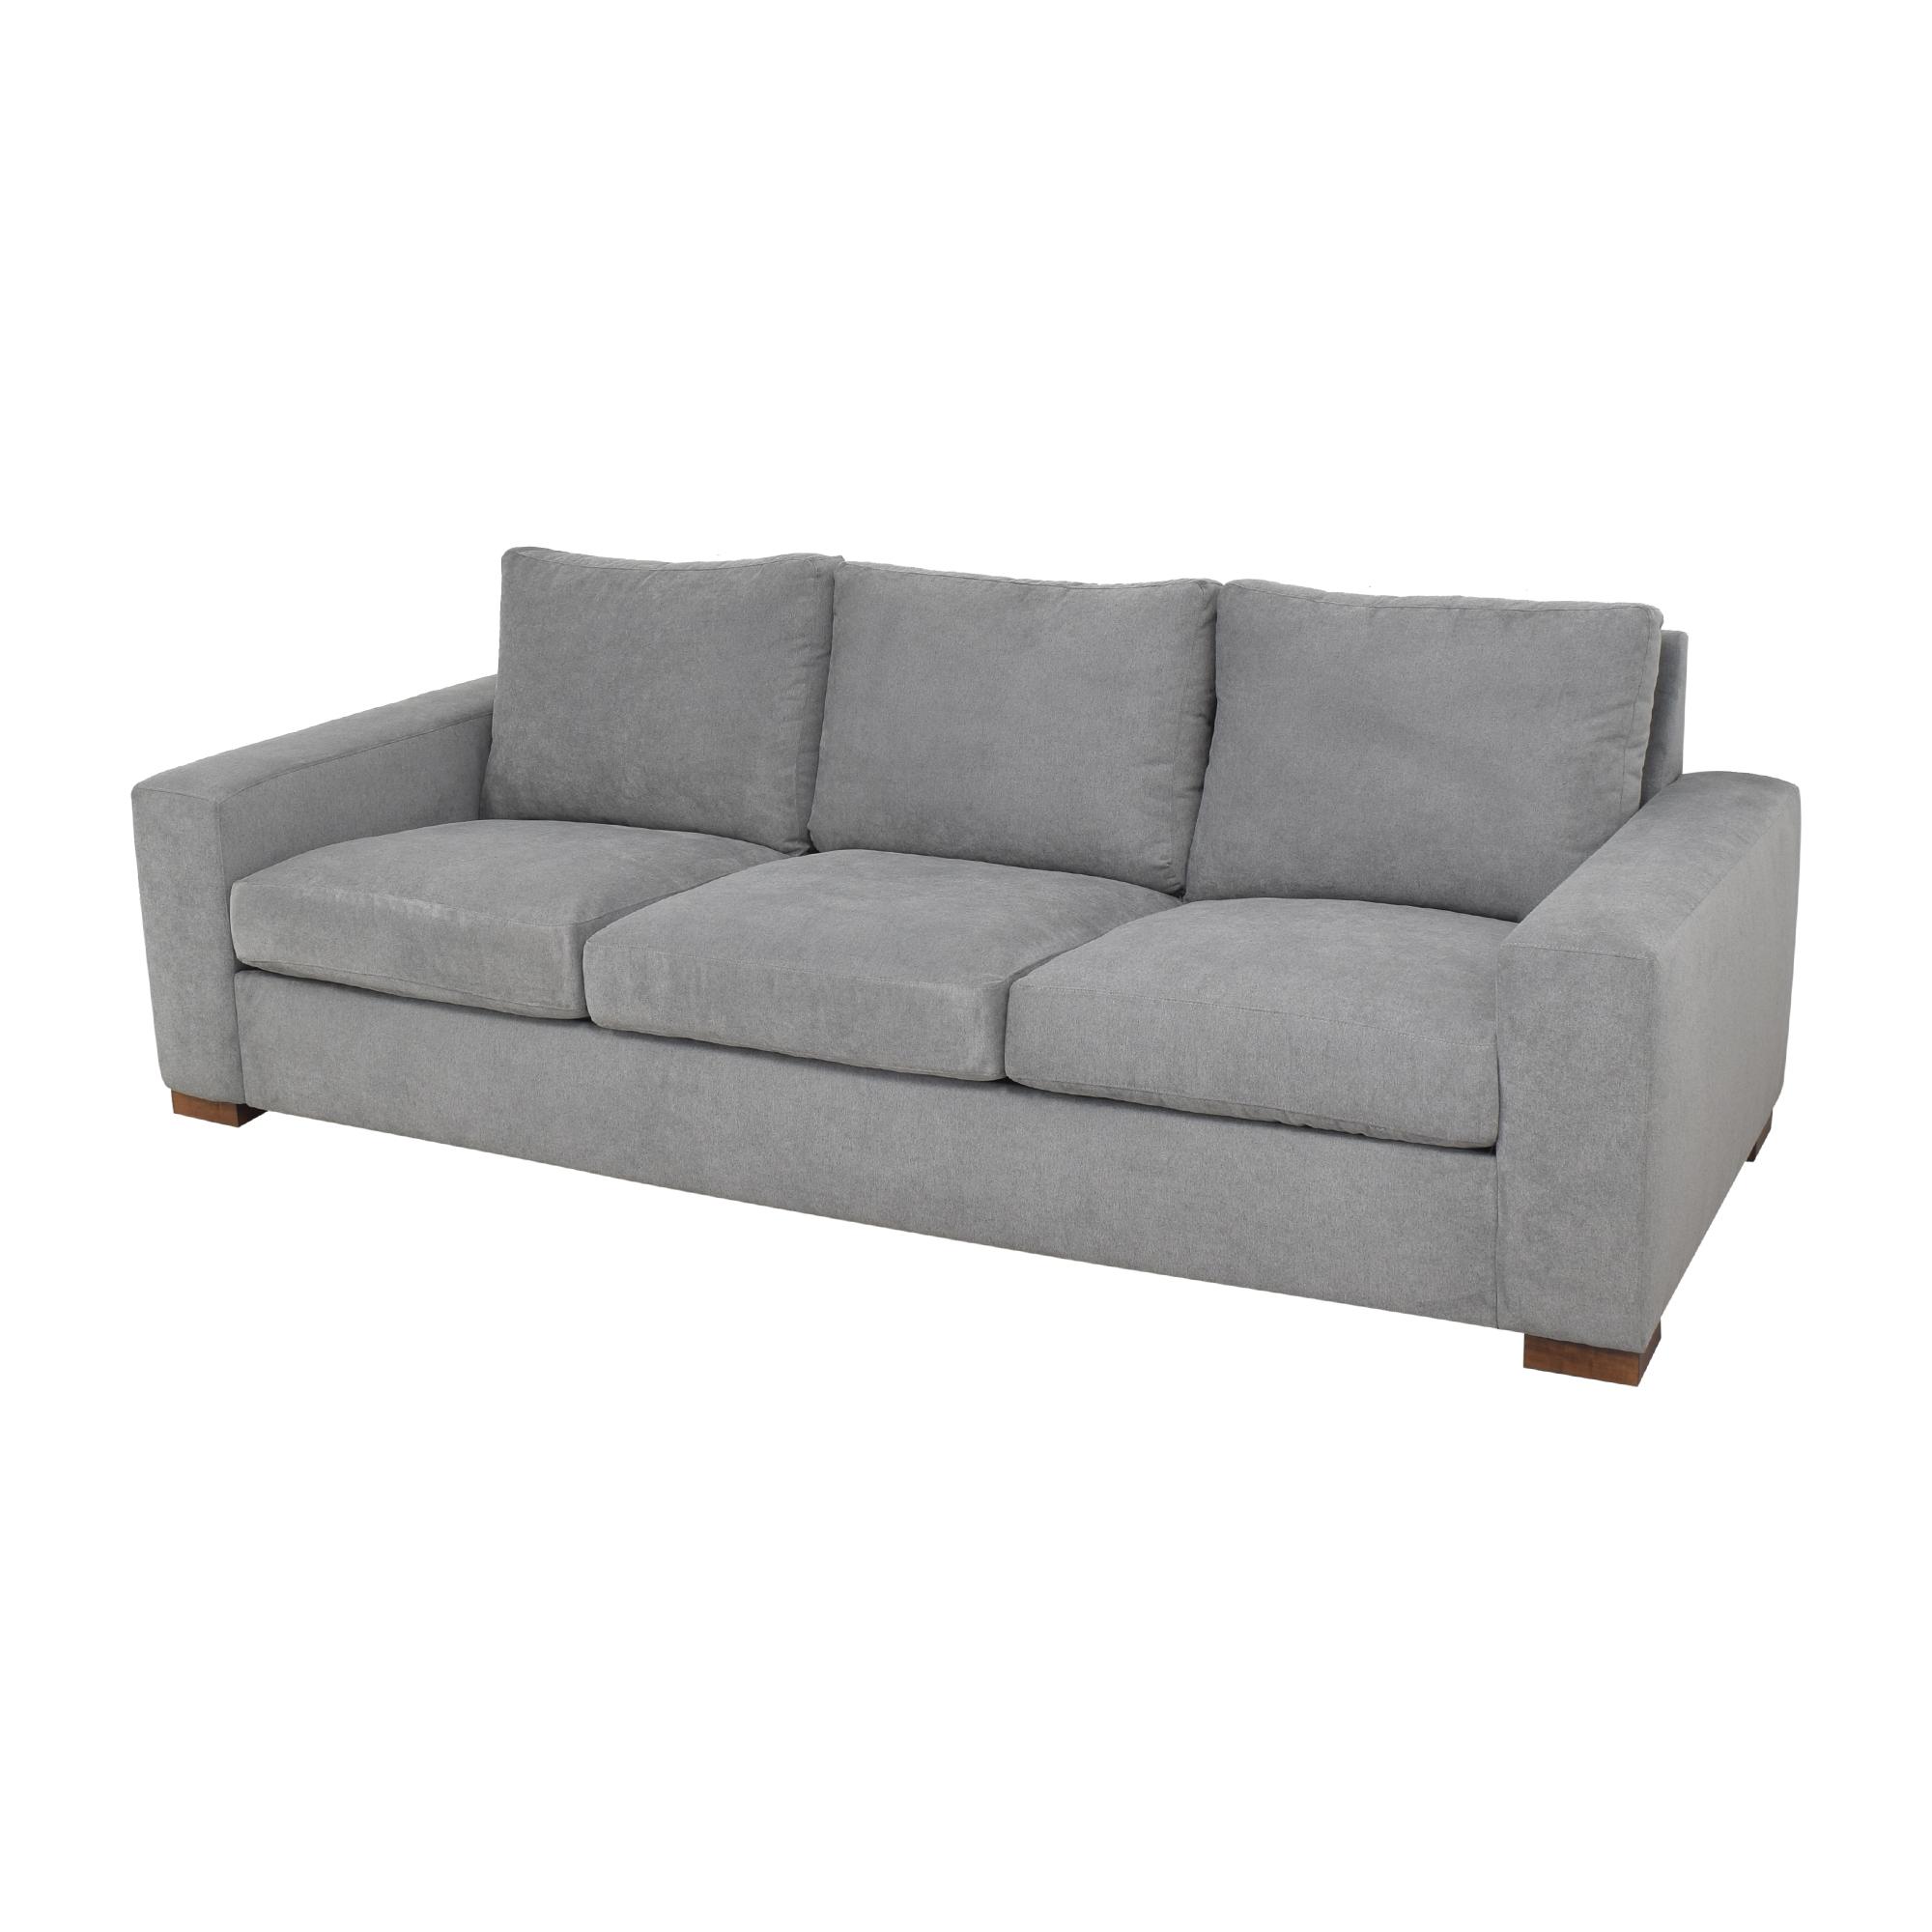 BenchMade Modern BenchMade Modern Couch Potato Sofa nj